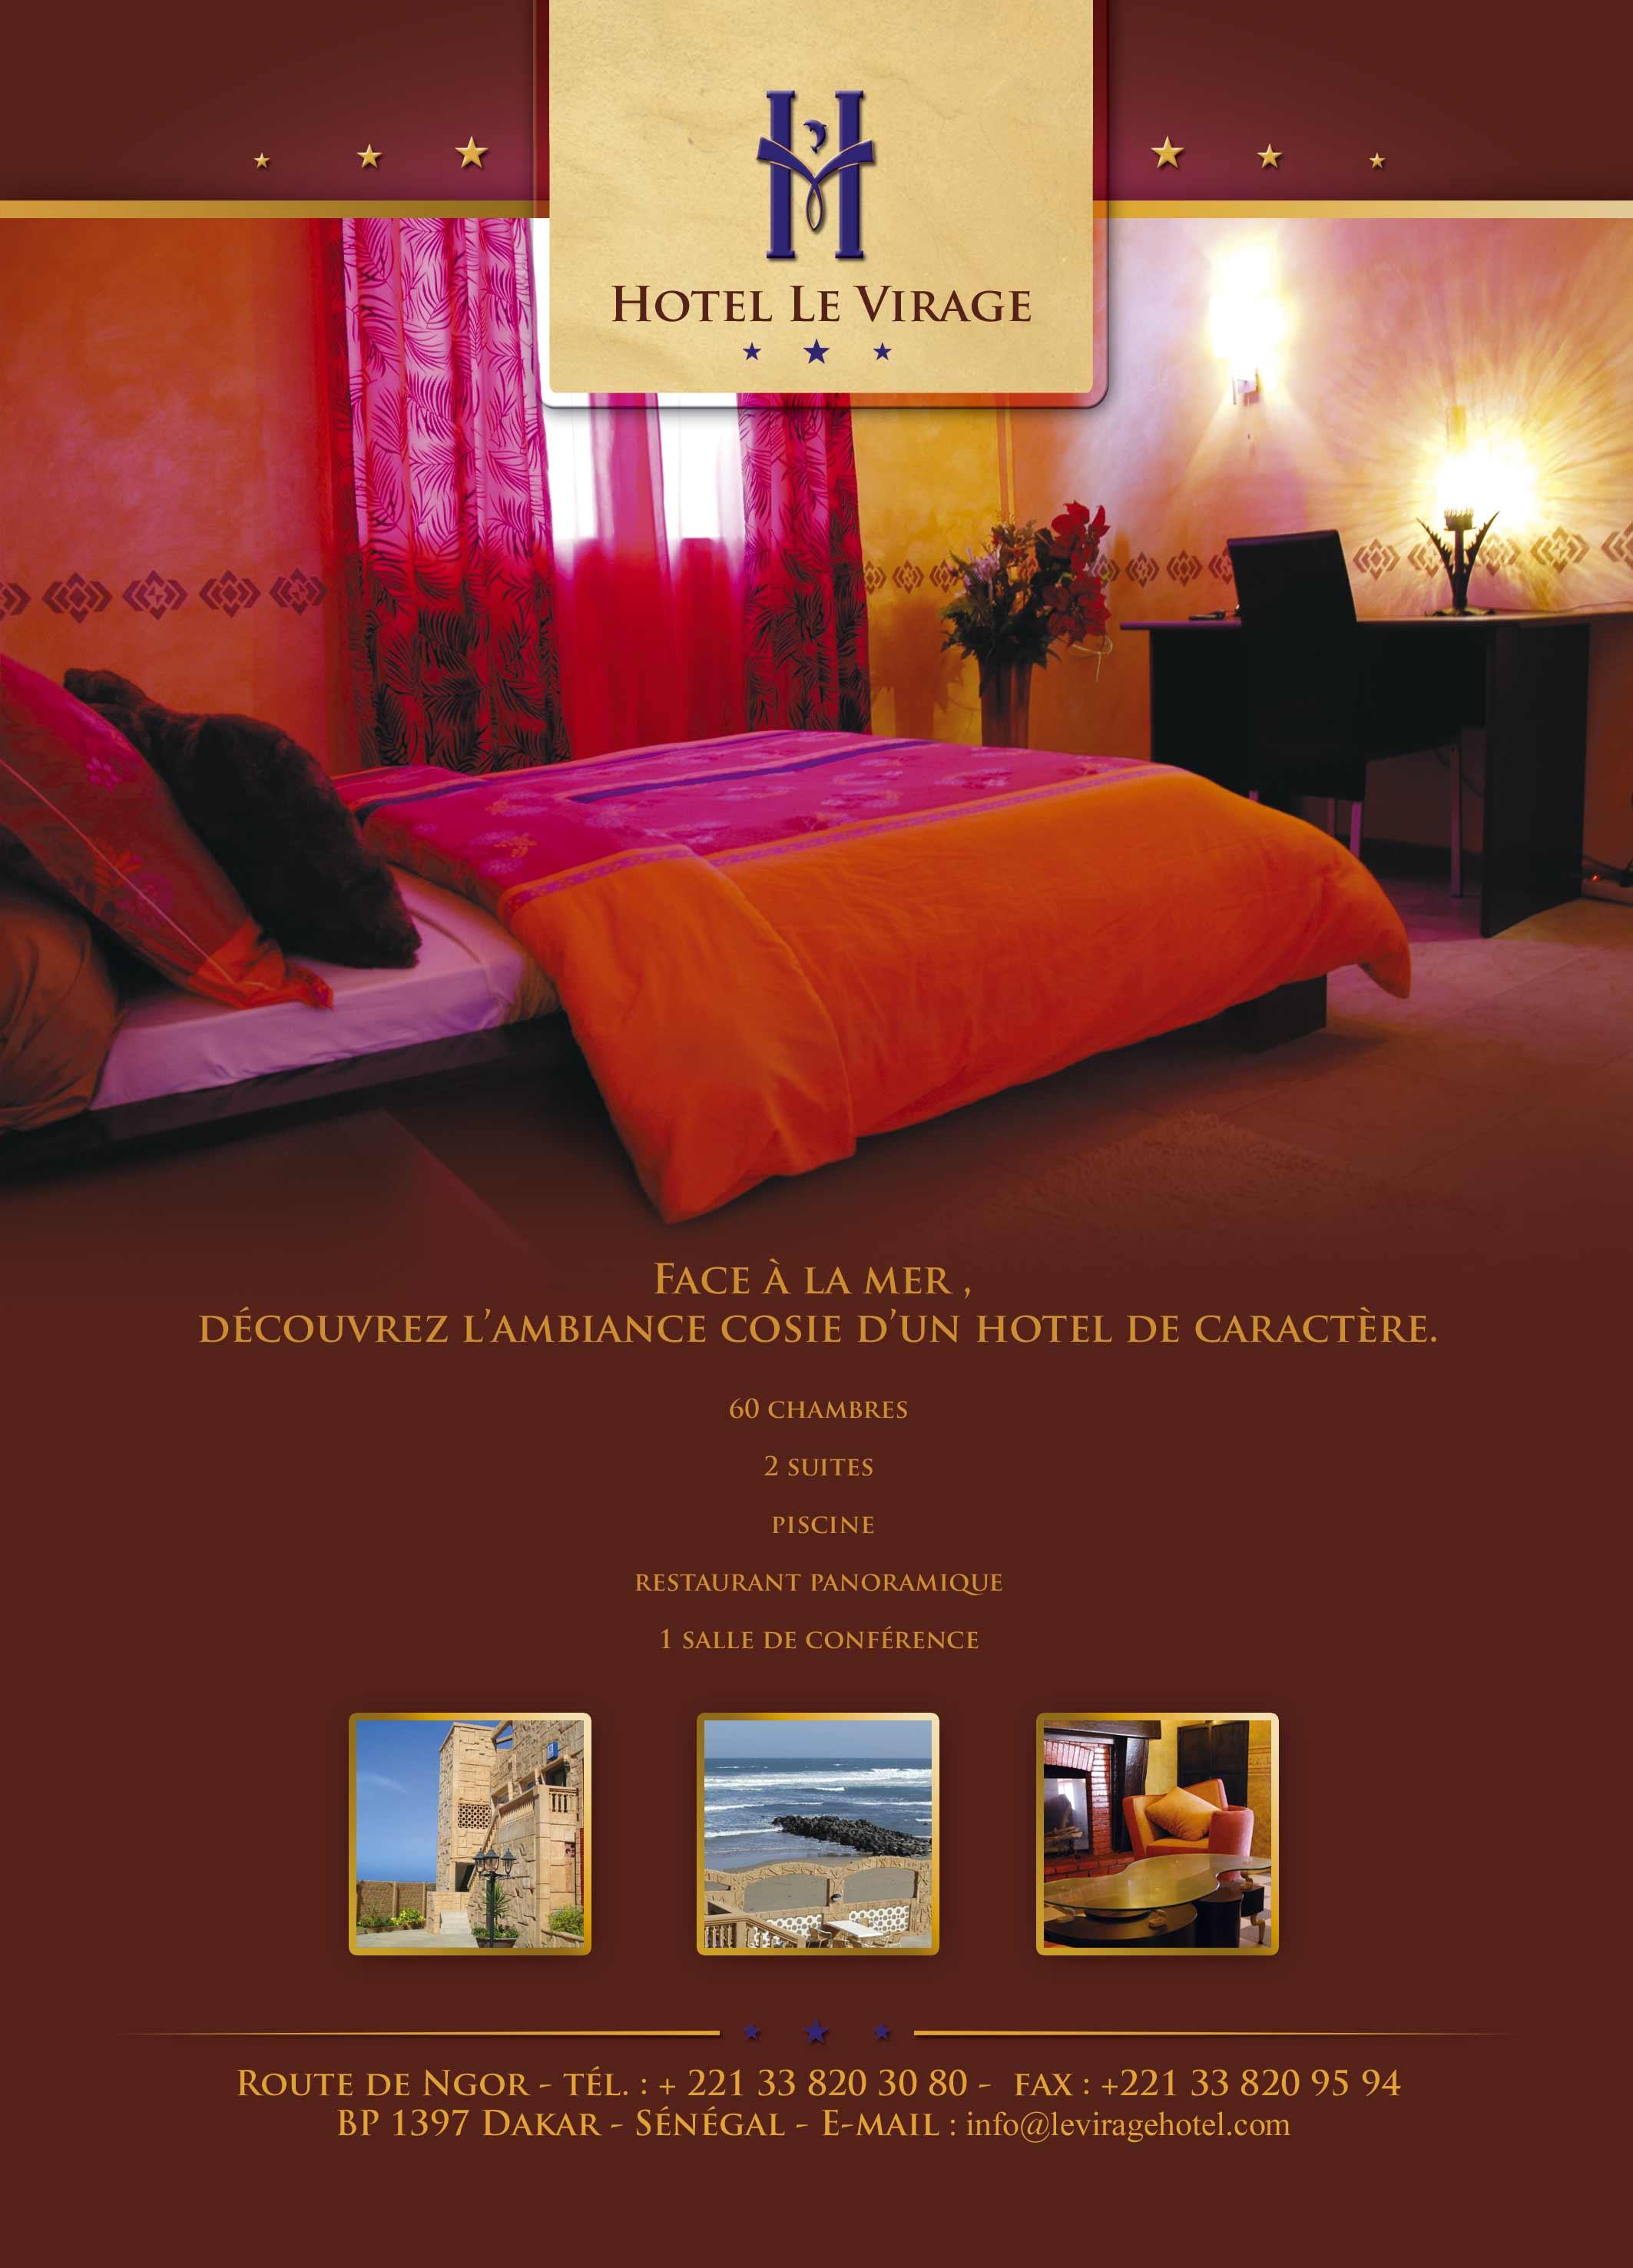 Hotel Le Virage